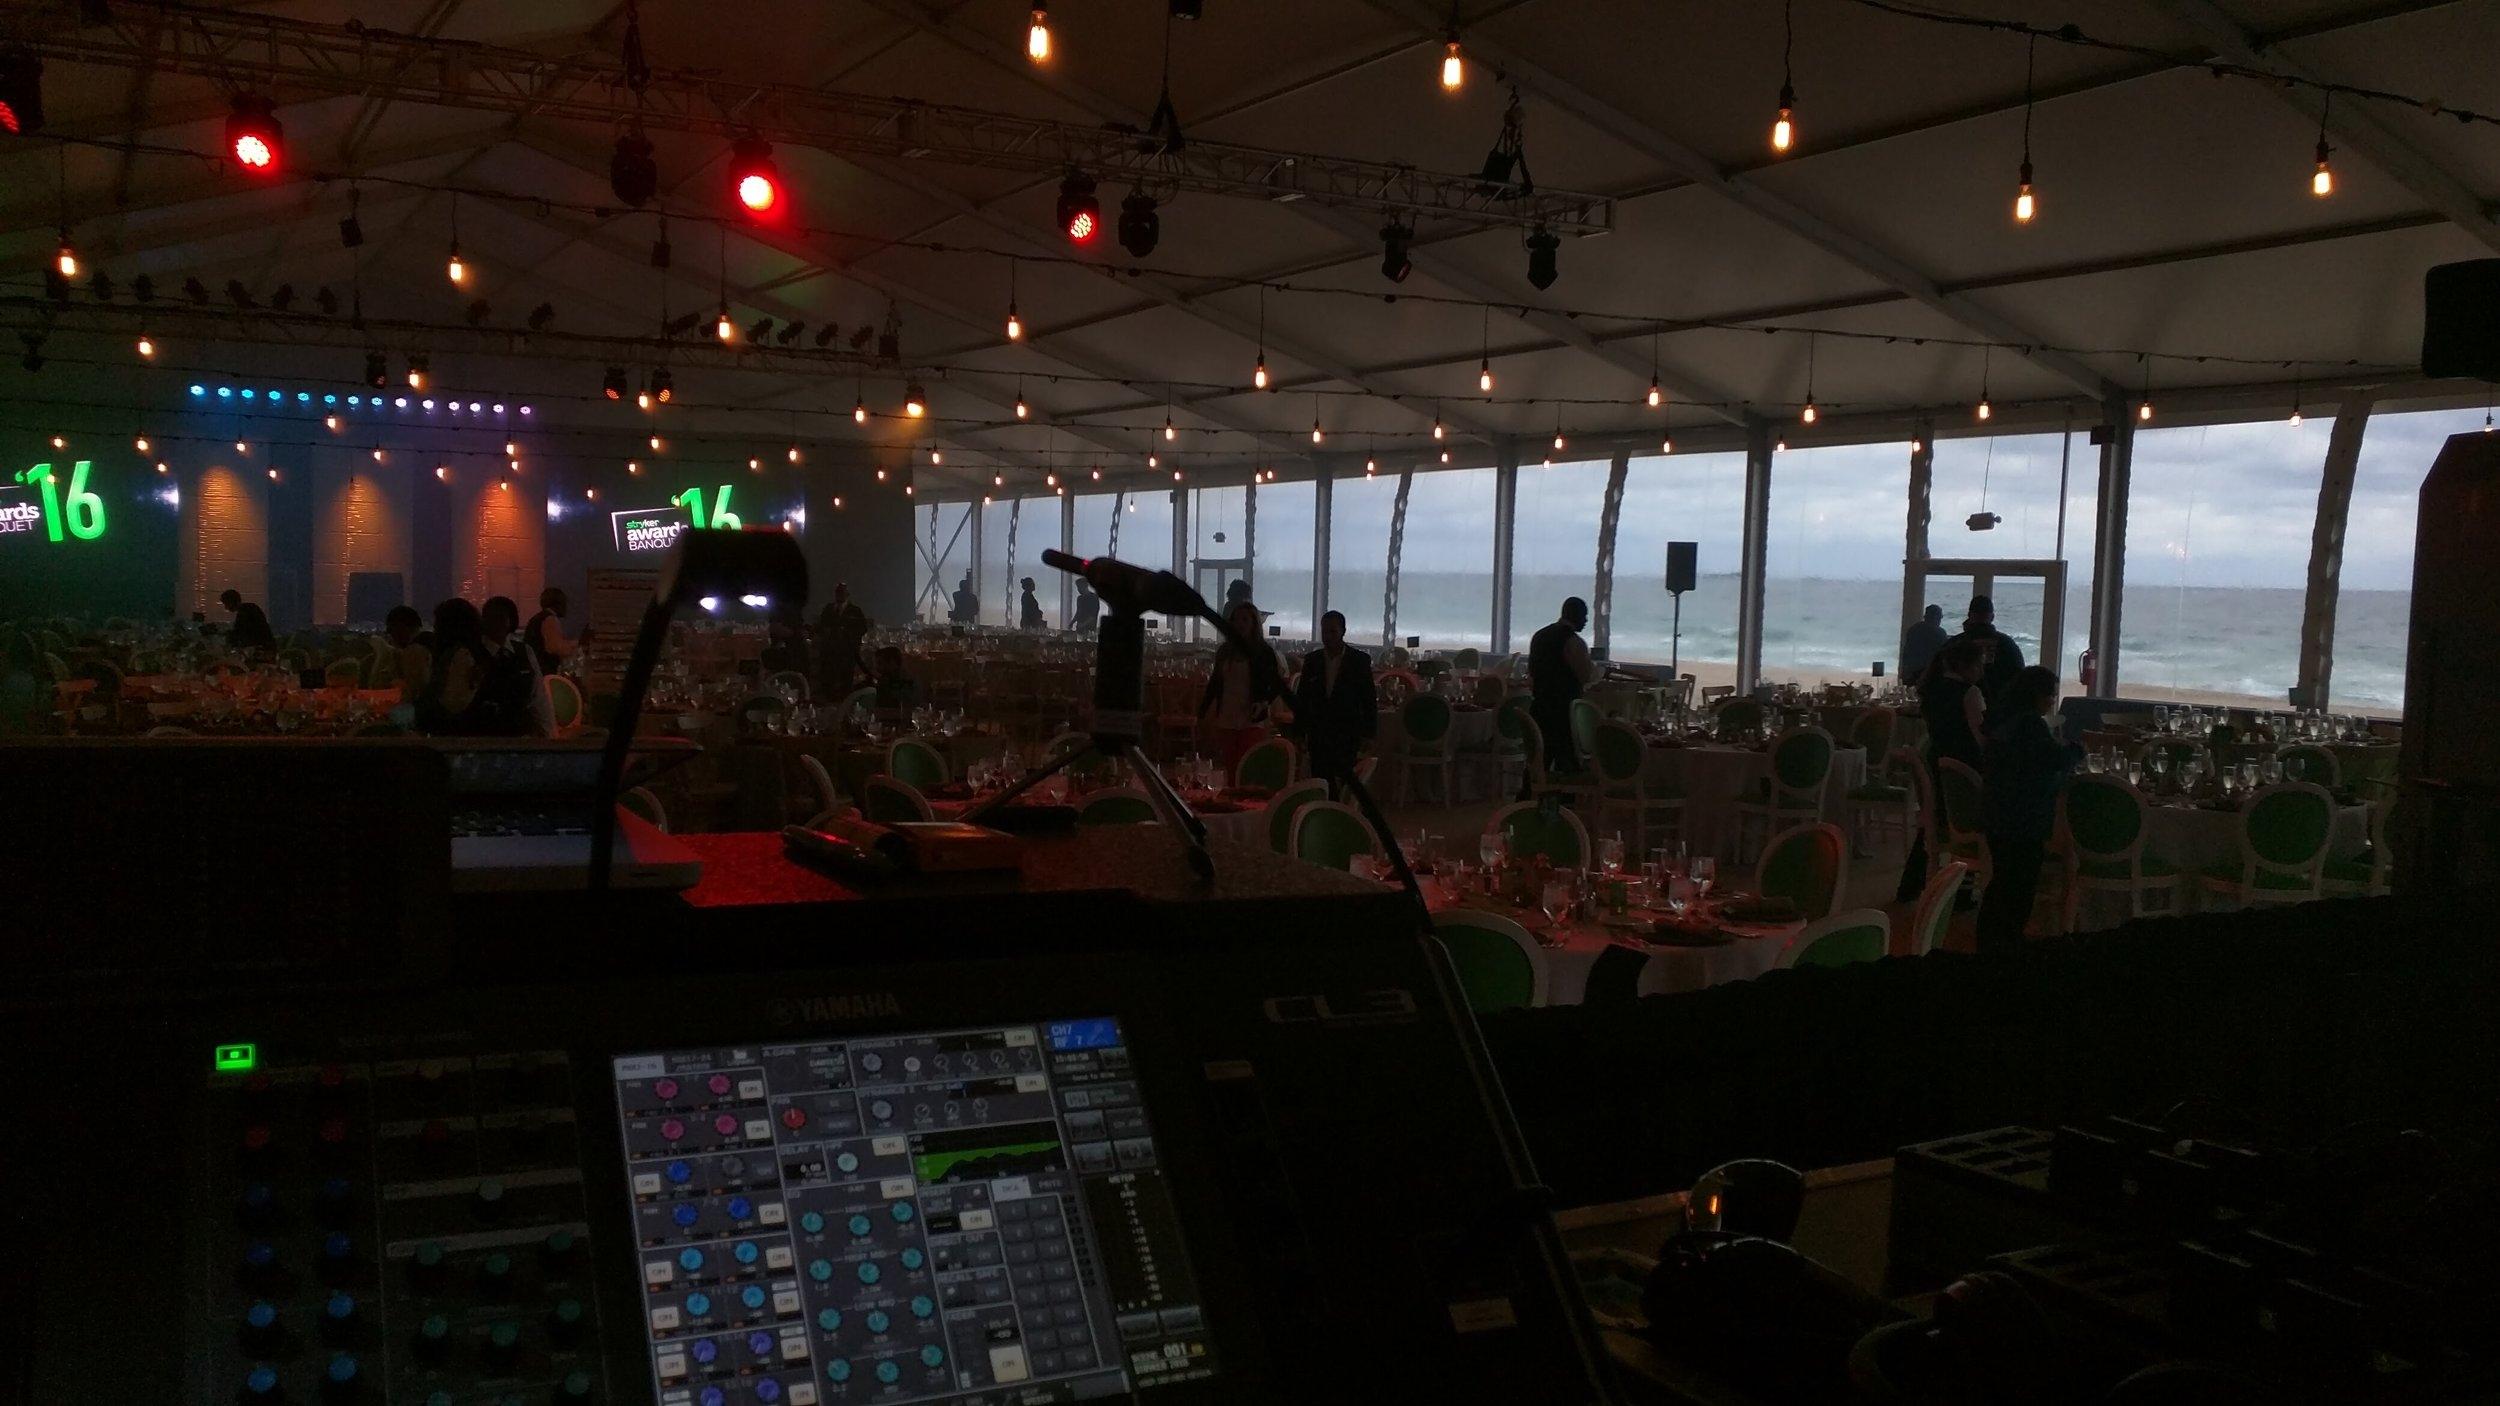 Corporate show on the Beach in Daytona Beach, FL